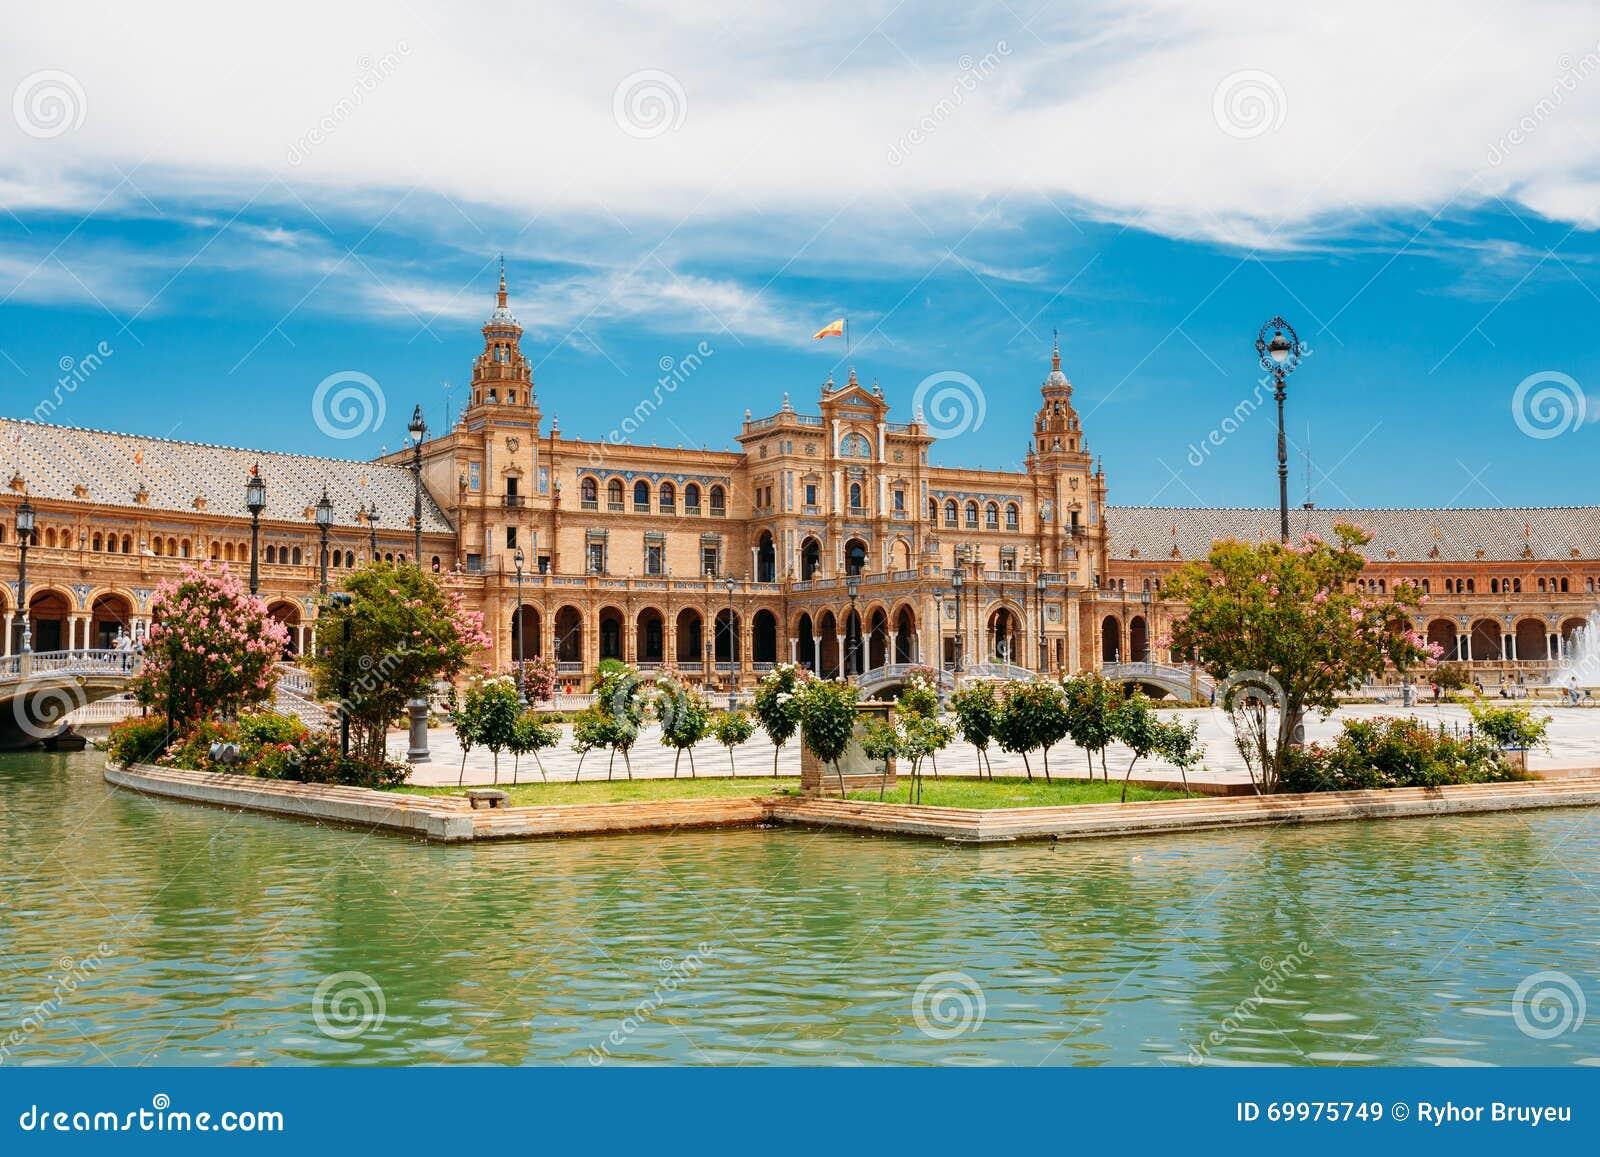 Beroemd oriëntatiepunt - Plaza DE Espana in Sevilla, Andalusia, Spanje